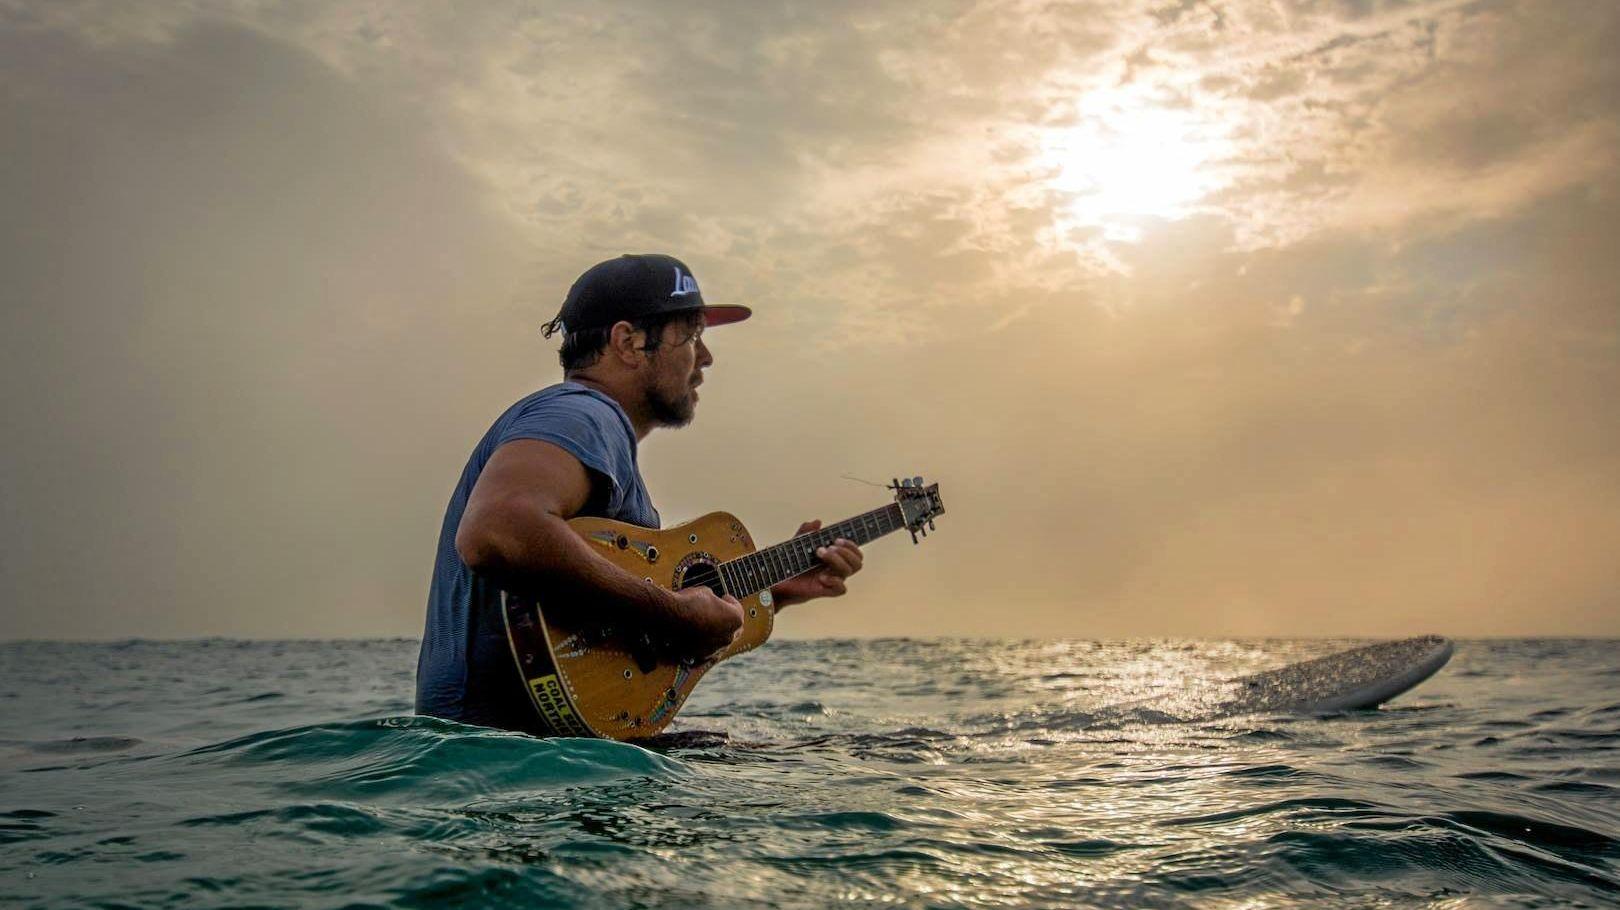 ISLAND STYLE: Northern Rivers musician and surfer Tom Avery, aka Blakboi.